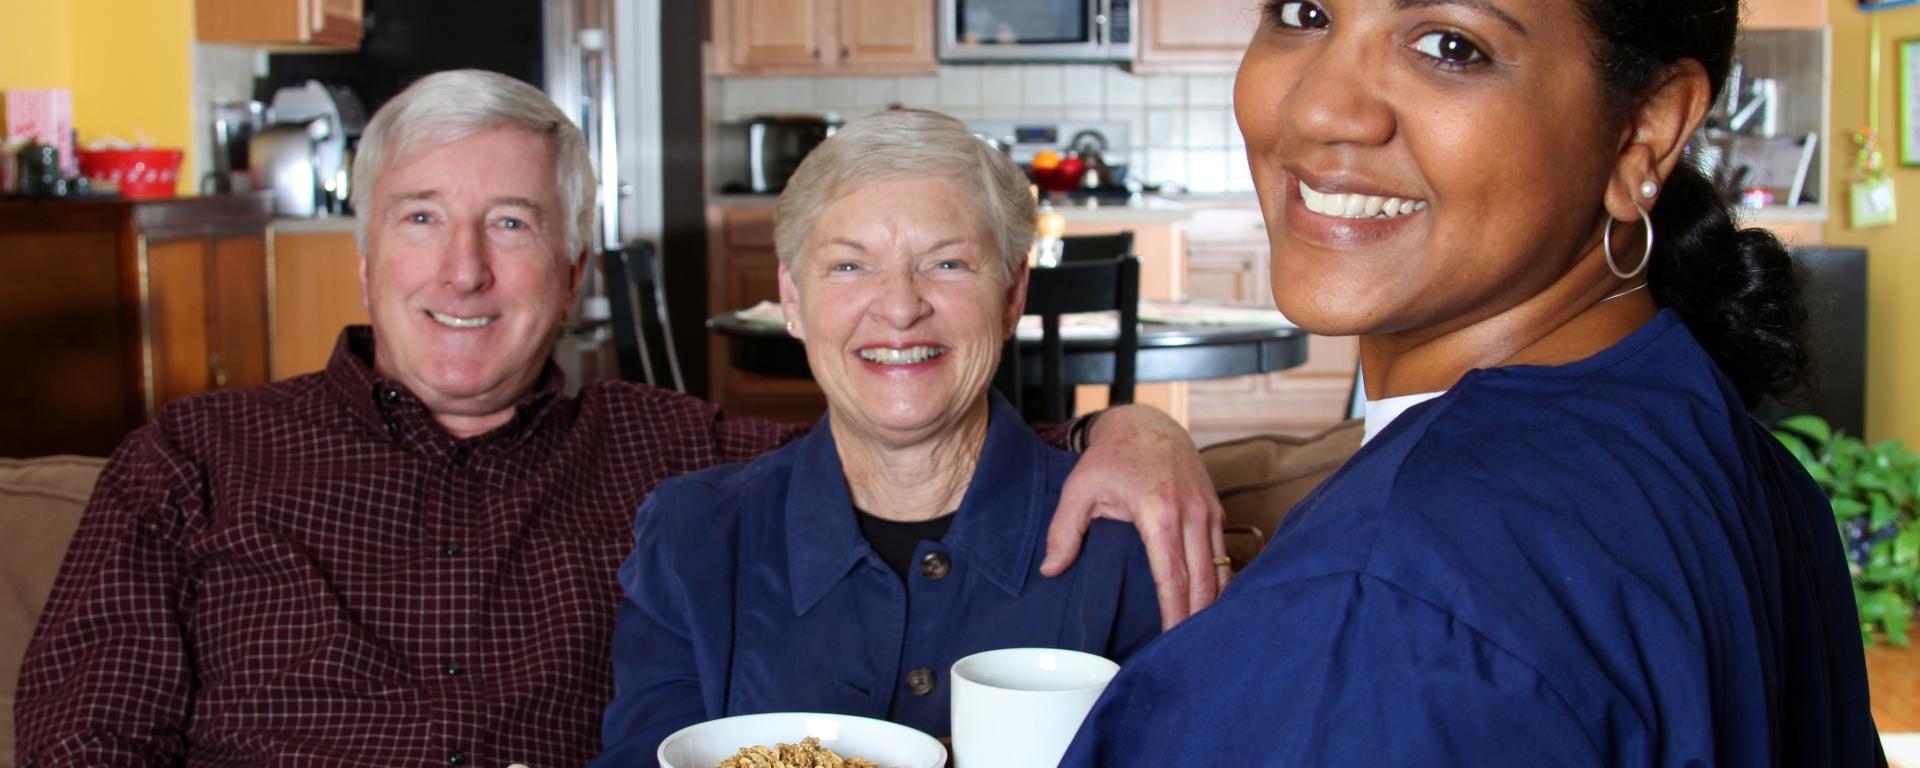 Caregiver bringing a tray of food to seniors.